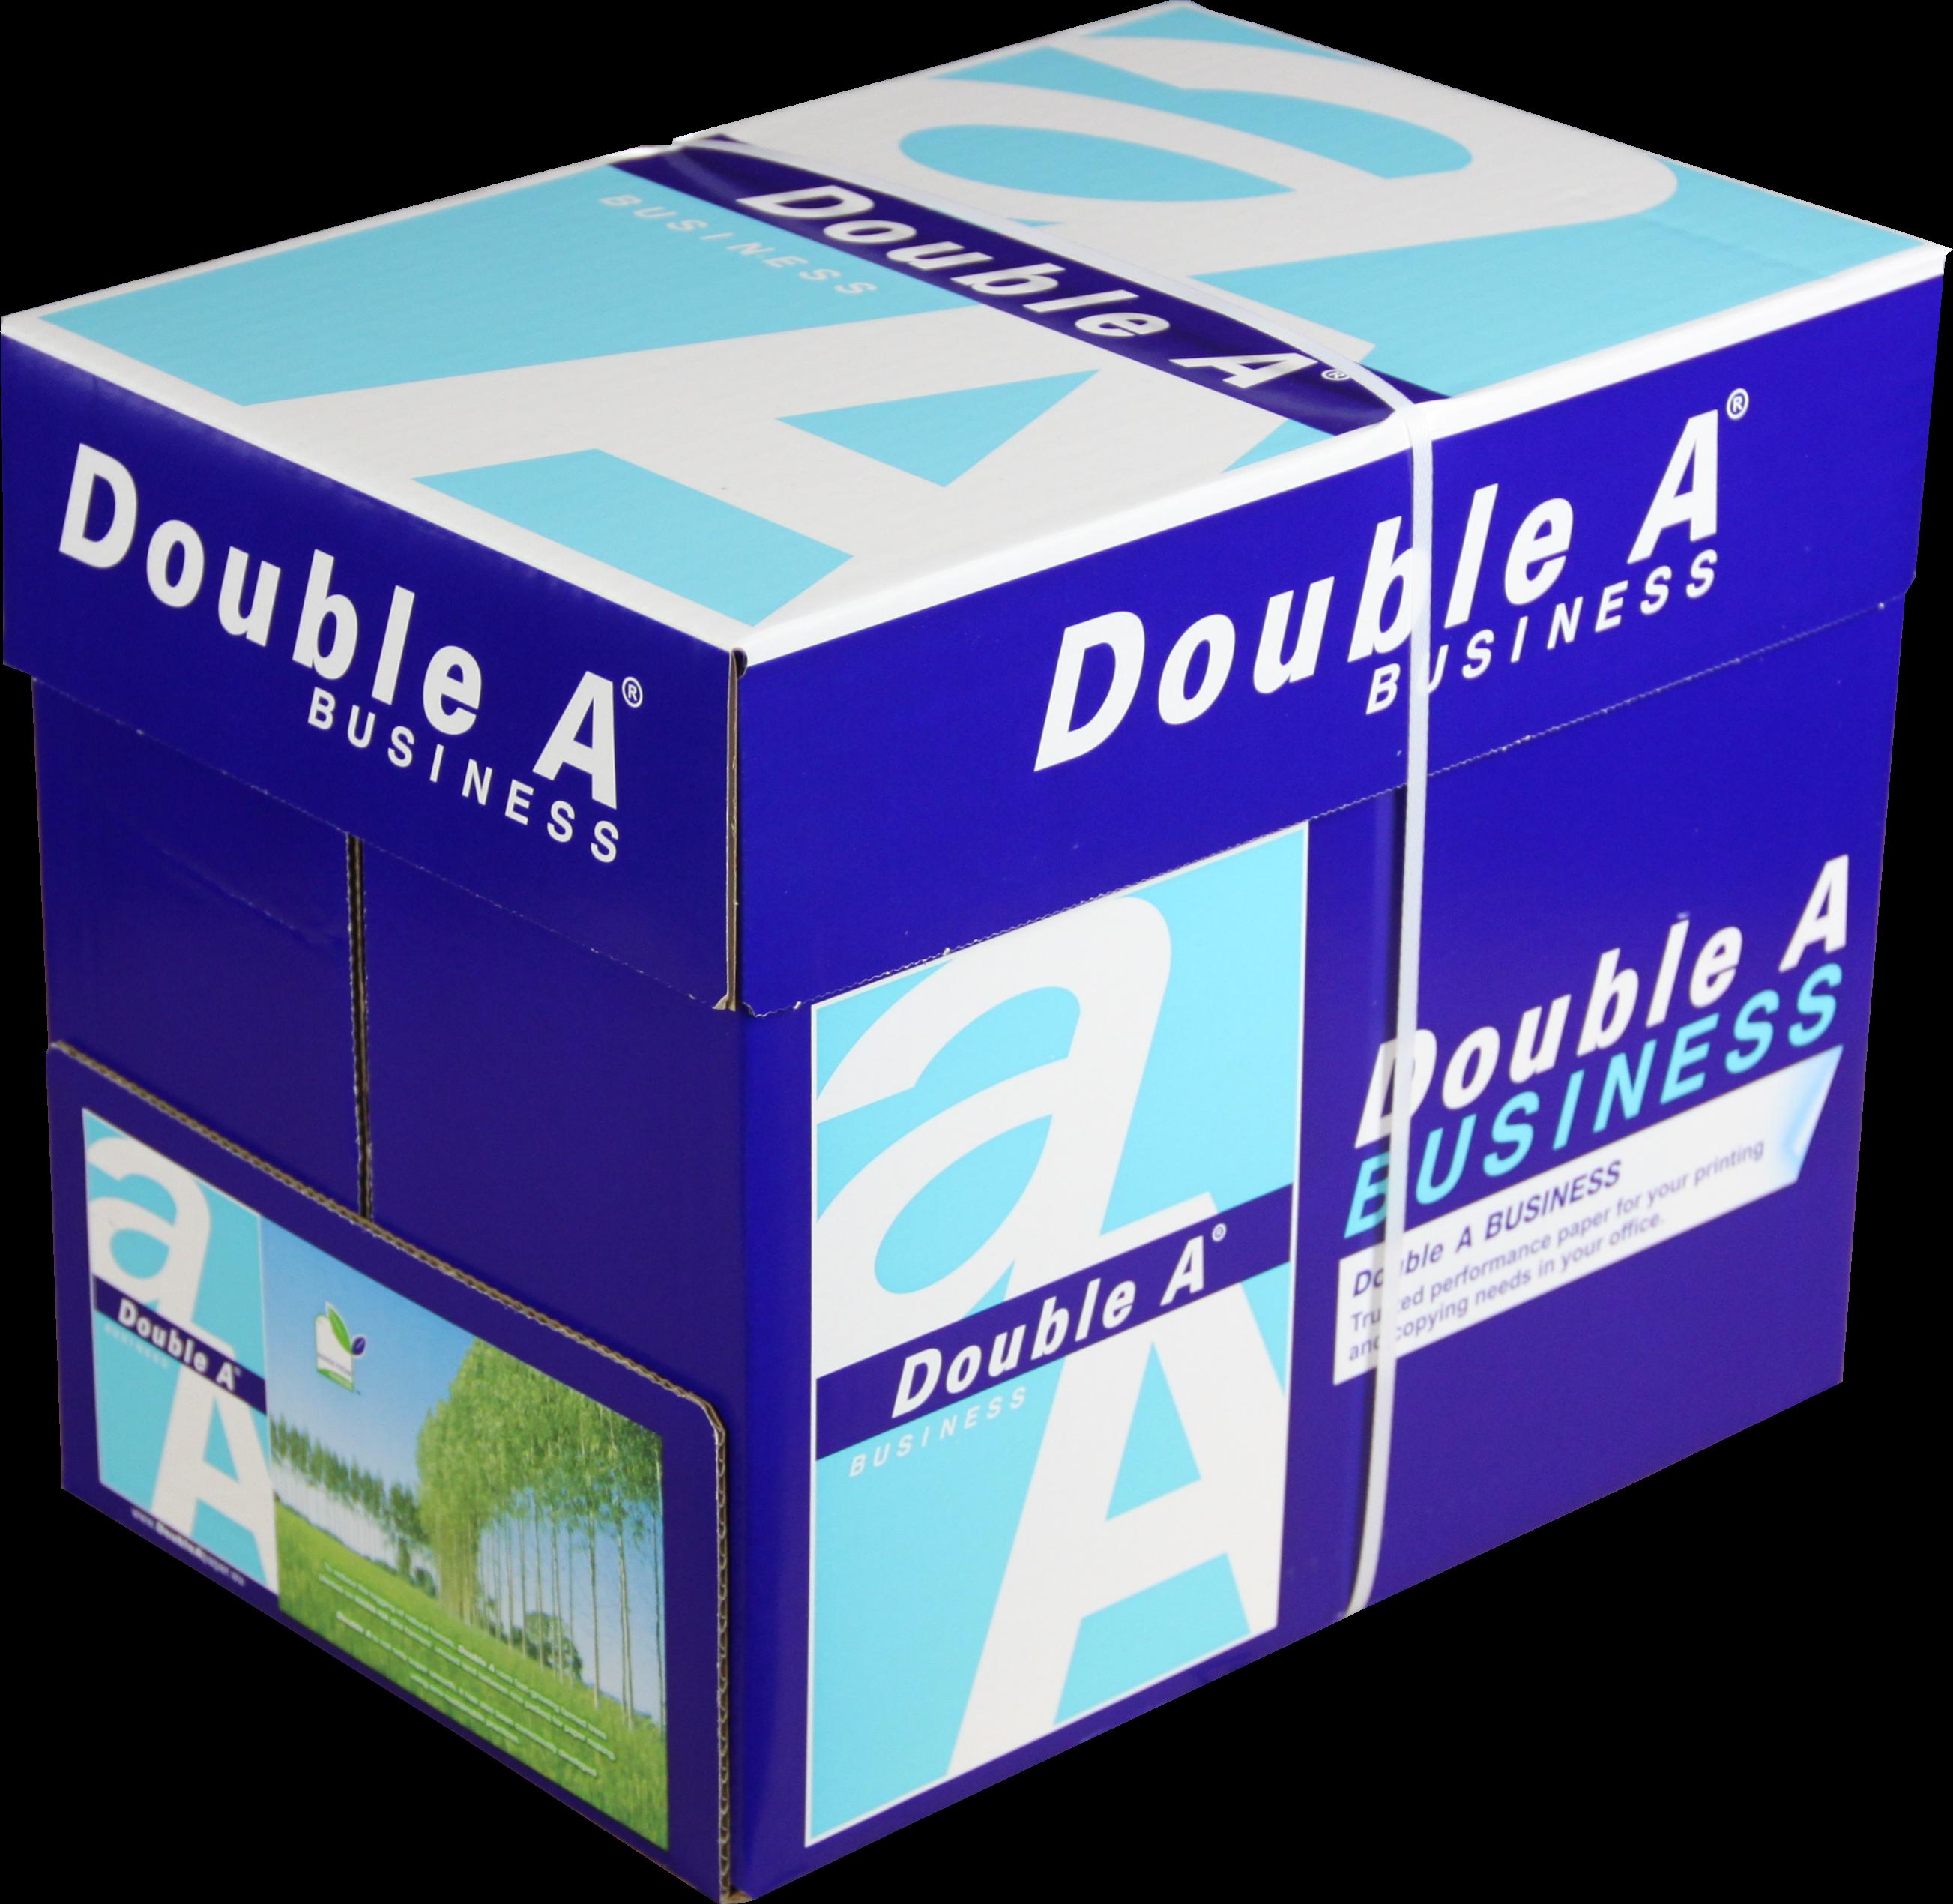 double a dap75b wit a4 papier printduurzaam. Black Bedroom Furniture Sets. Home Design Ideas